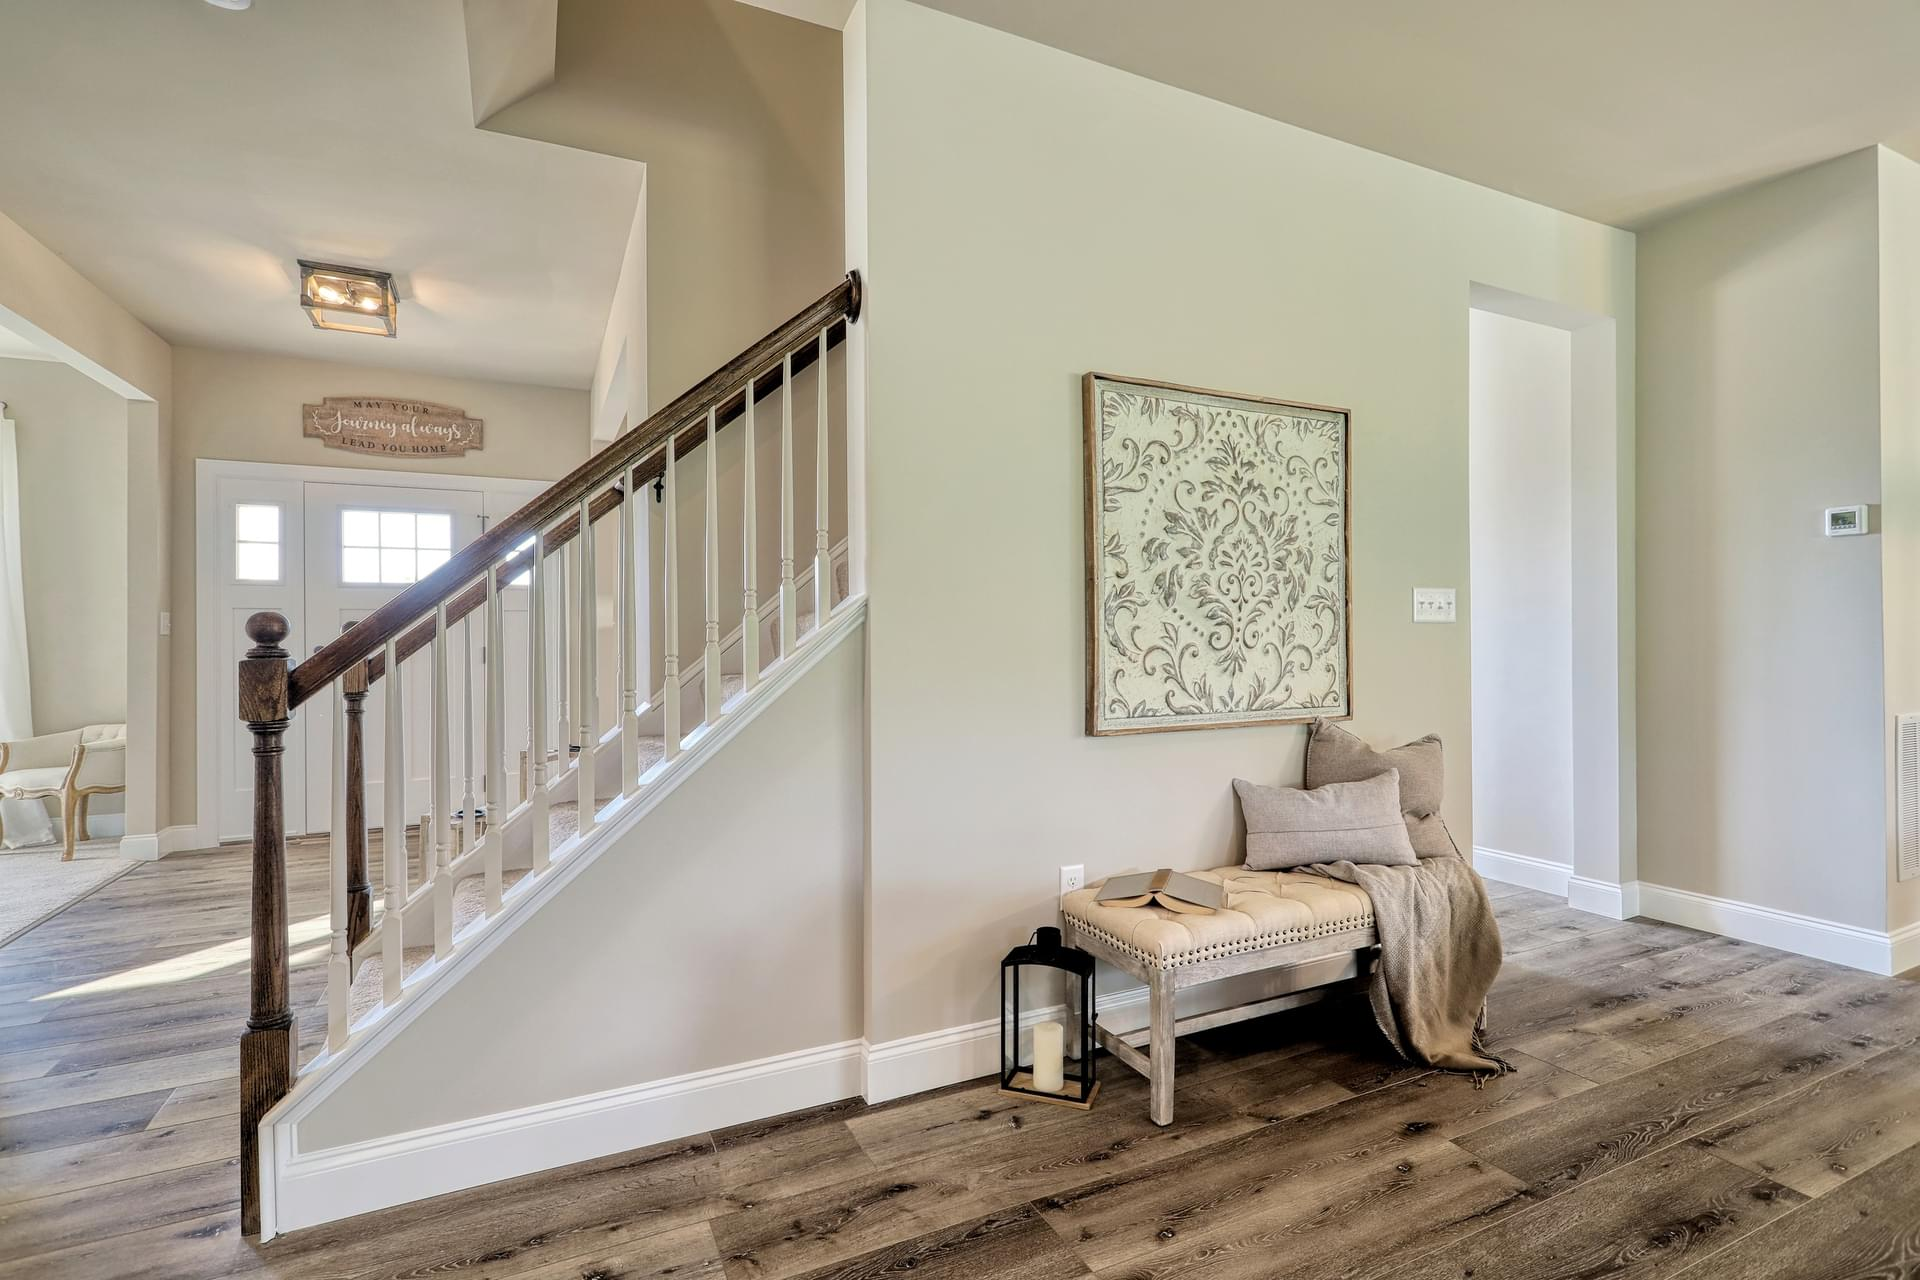 Copper Beech New Home in Morgantown, PA